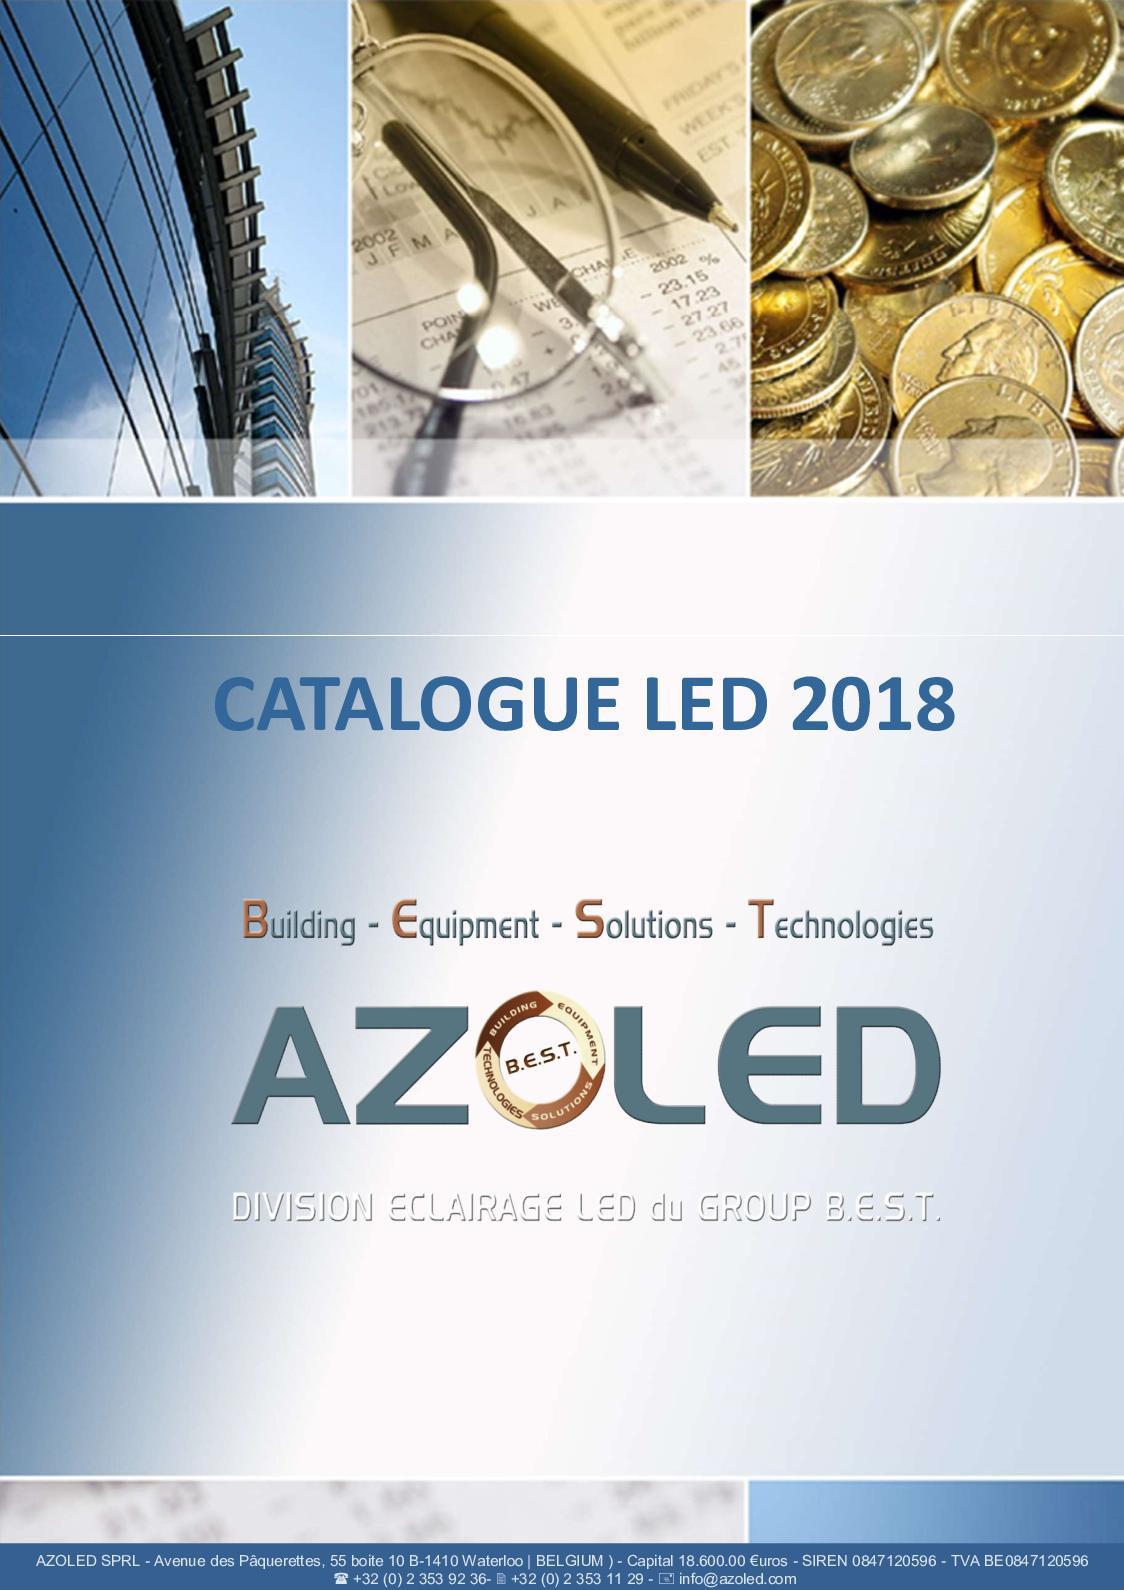 Catalogue Azoled Novembre 2018